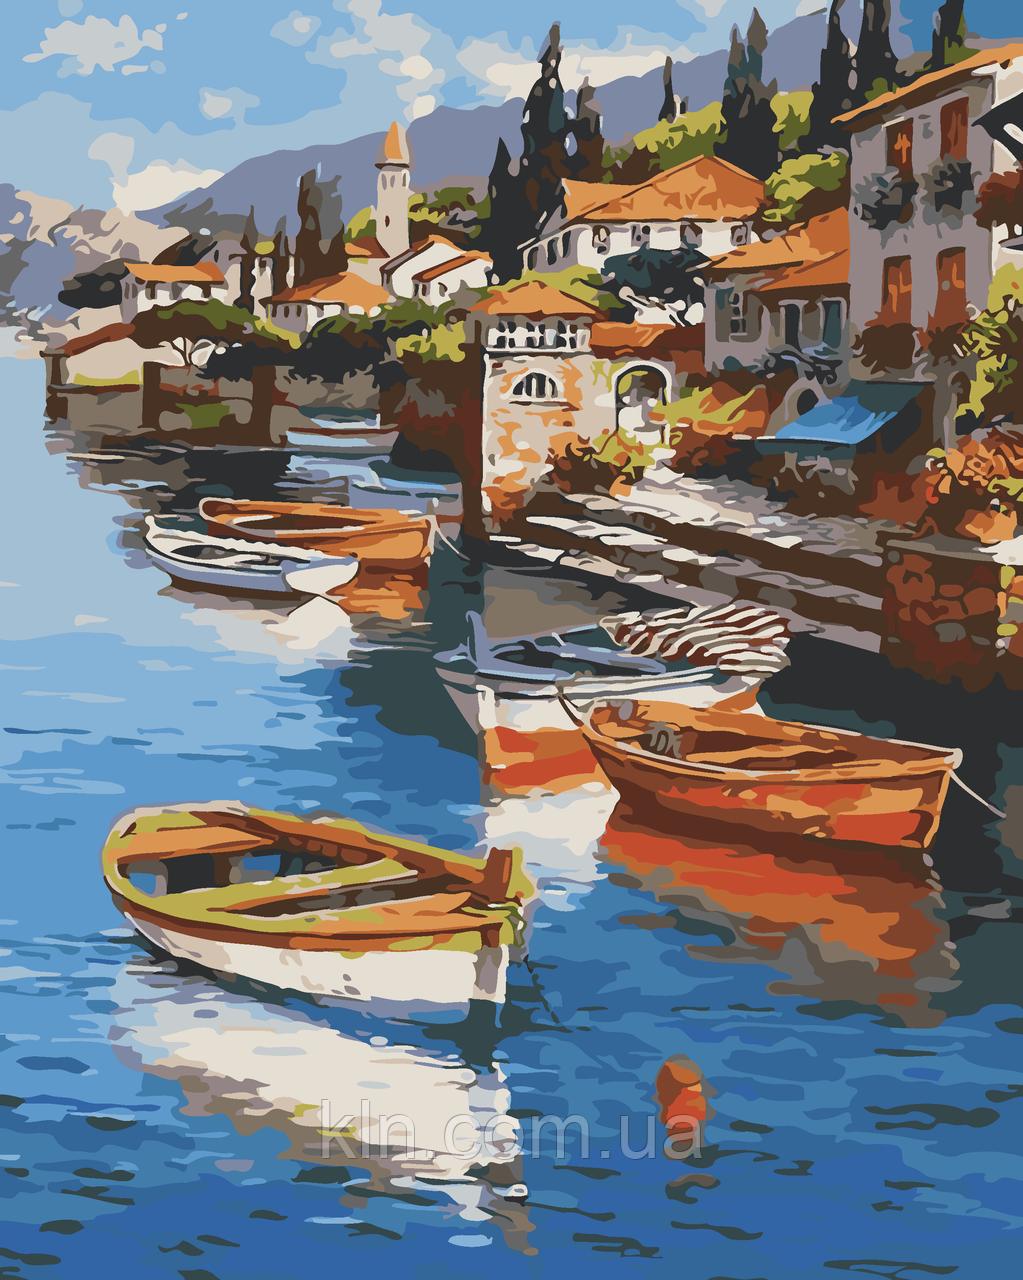 Картина по номерам ArtStory Тихая бухта 40 х 50 см (арт. AS0025)